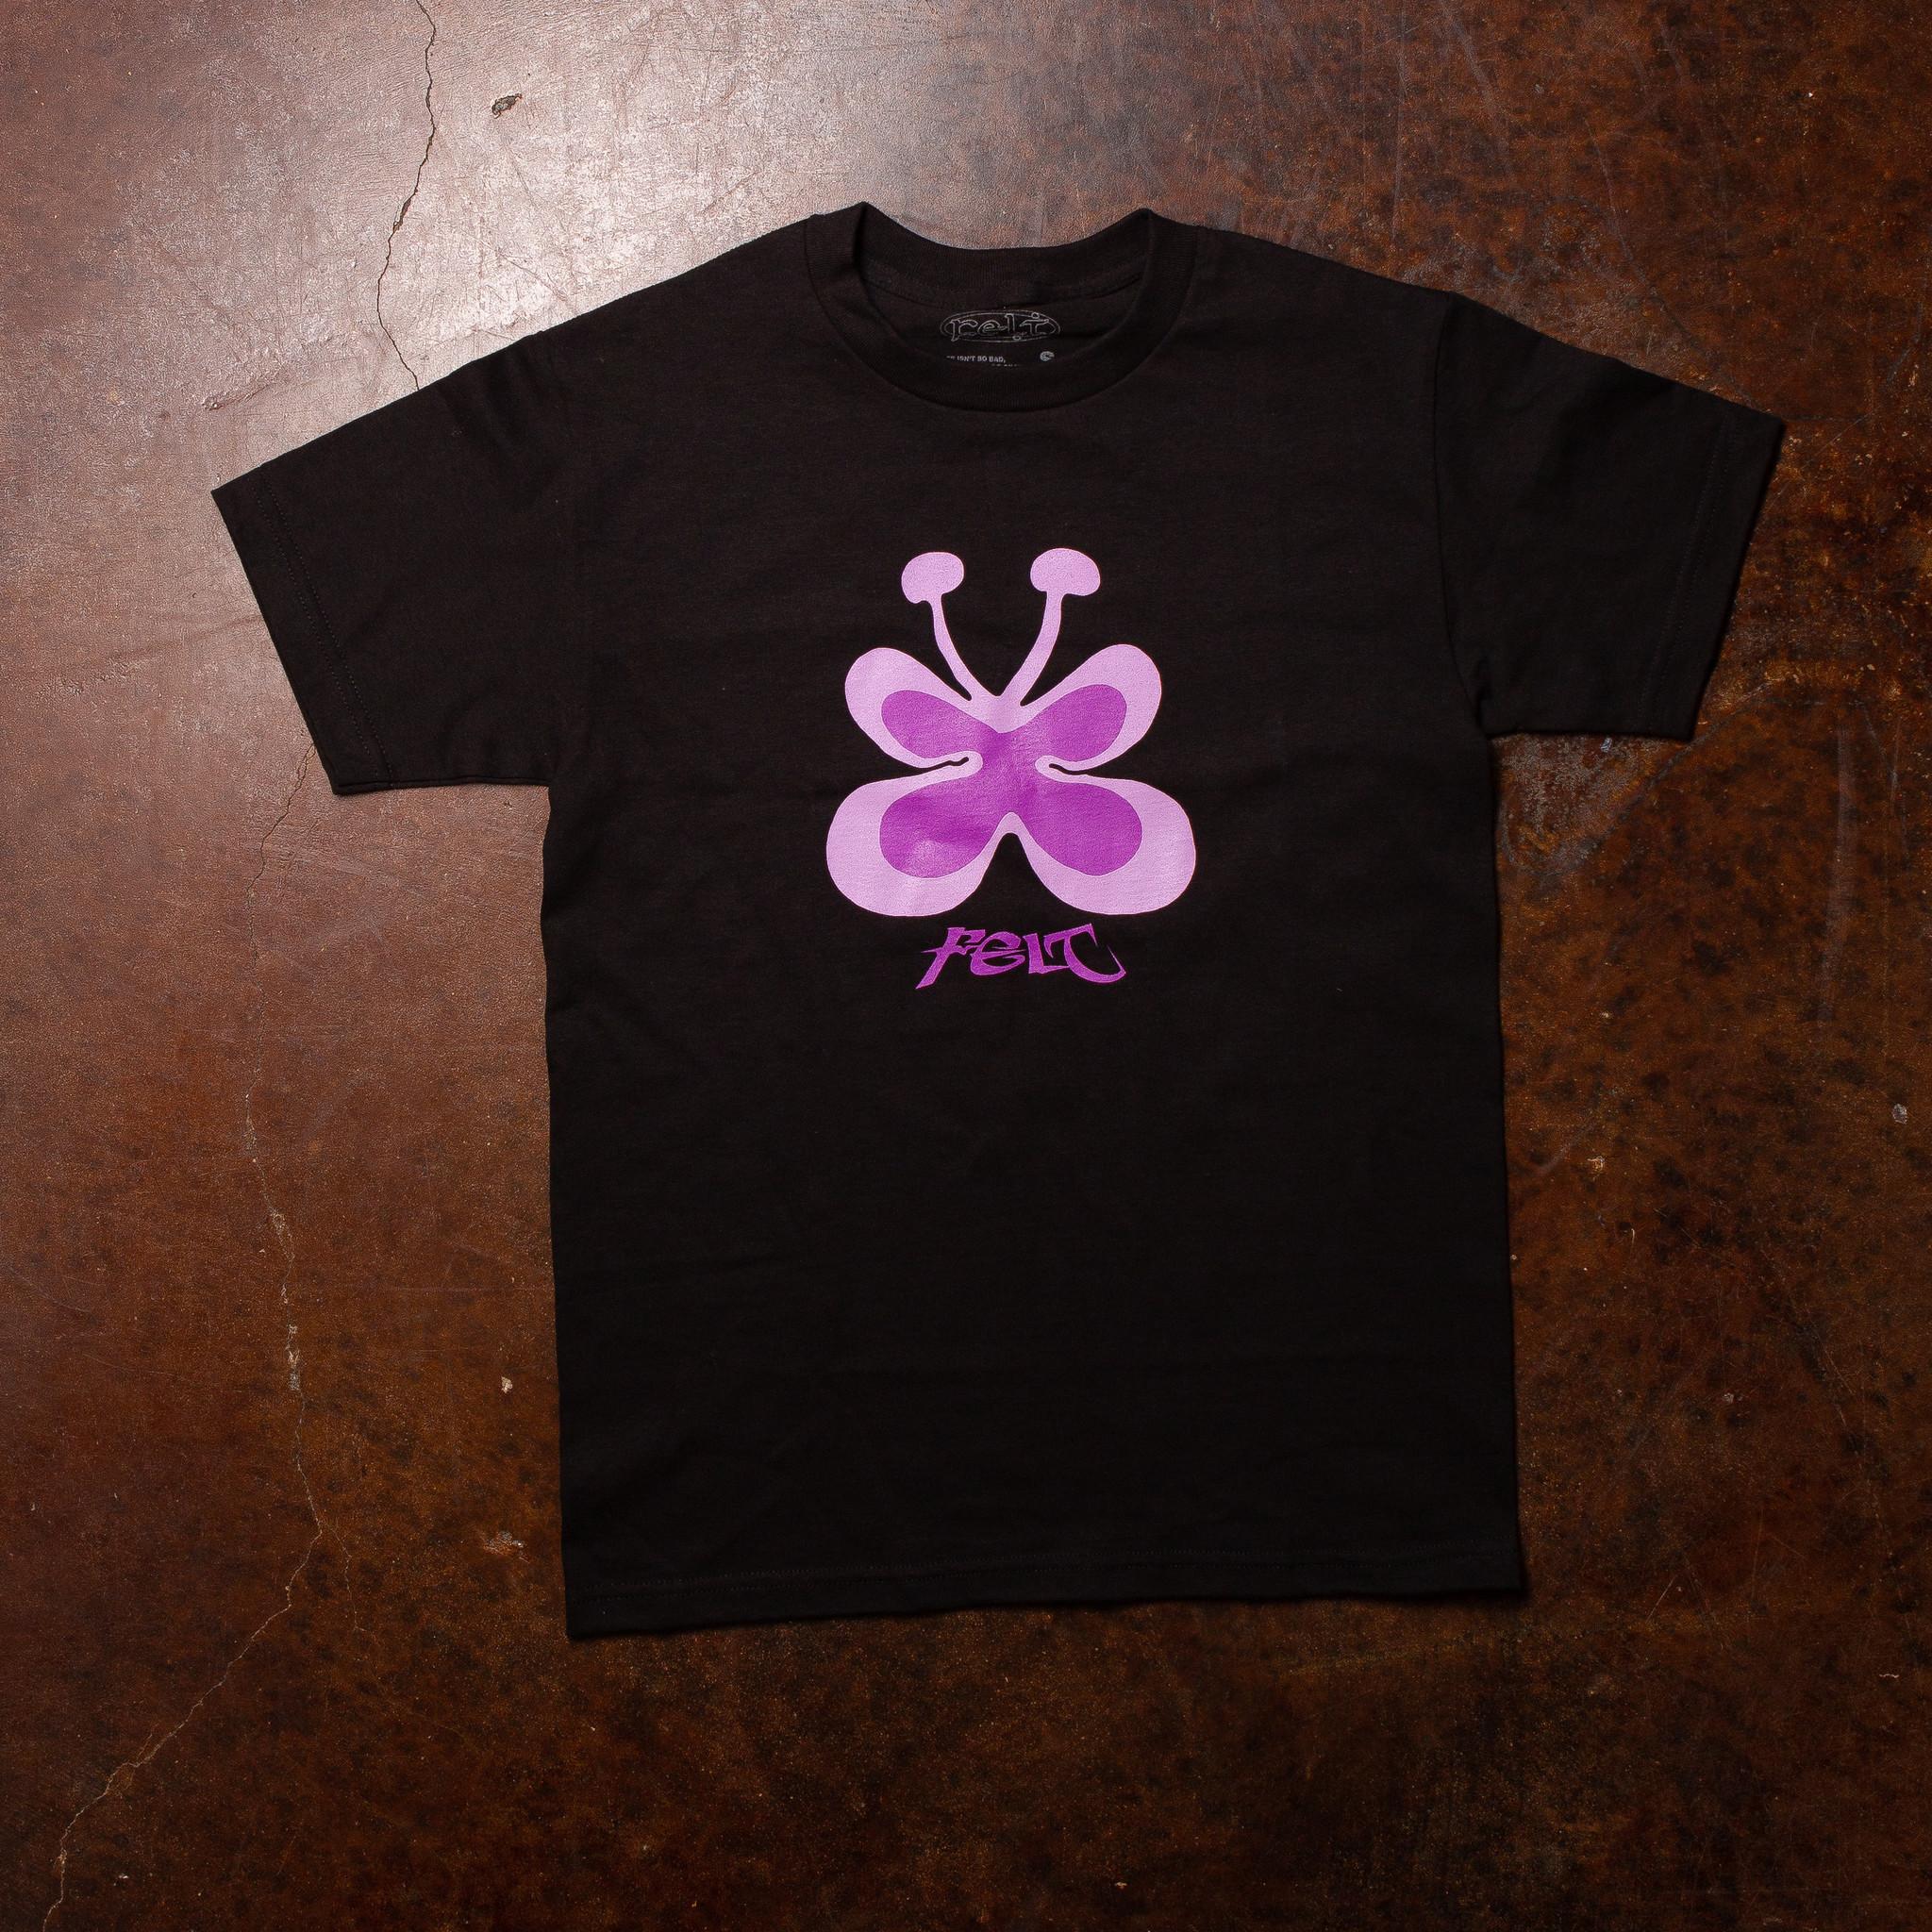 FELT Toon Butterfly Tee Black